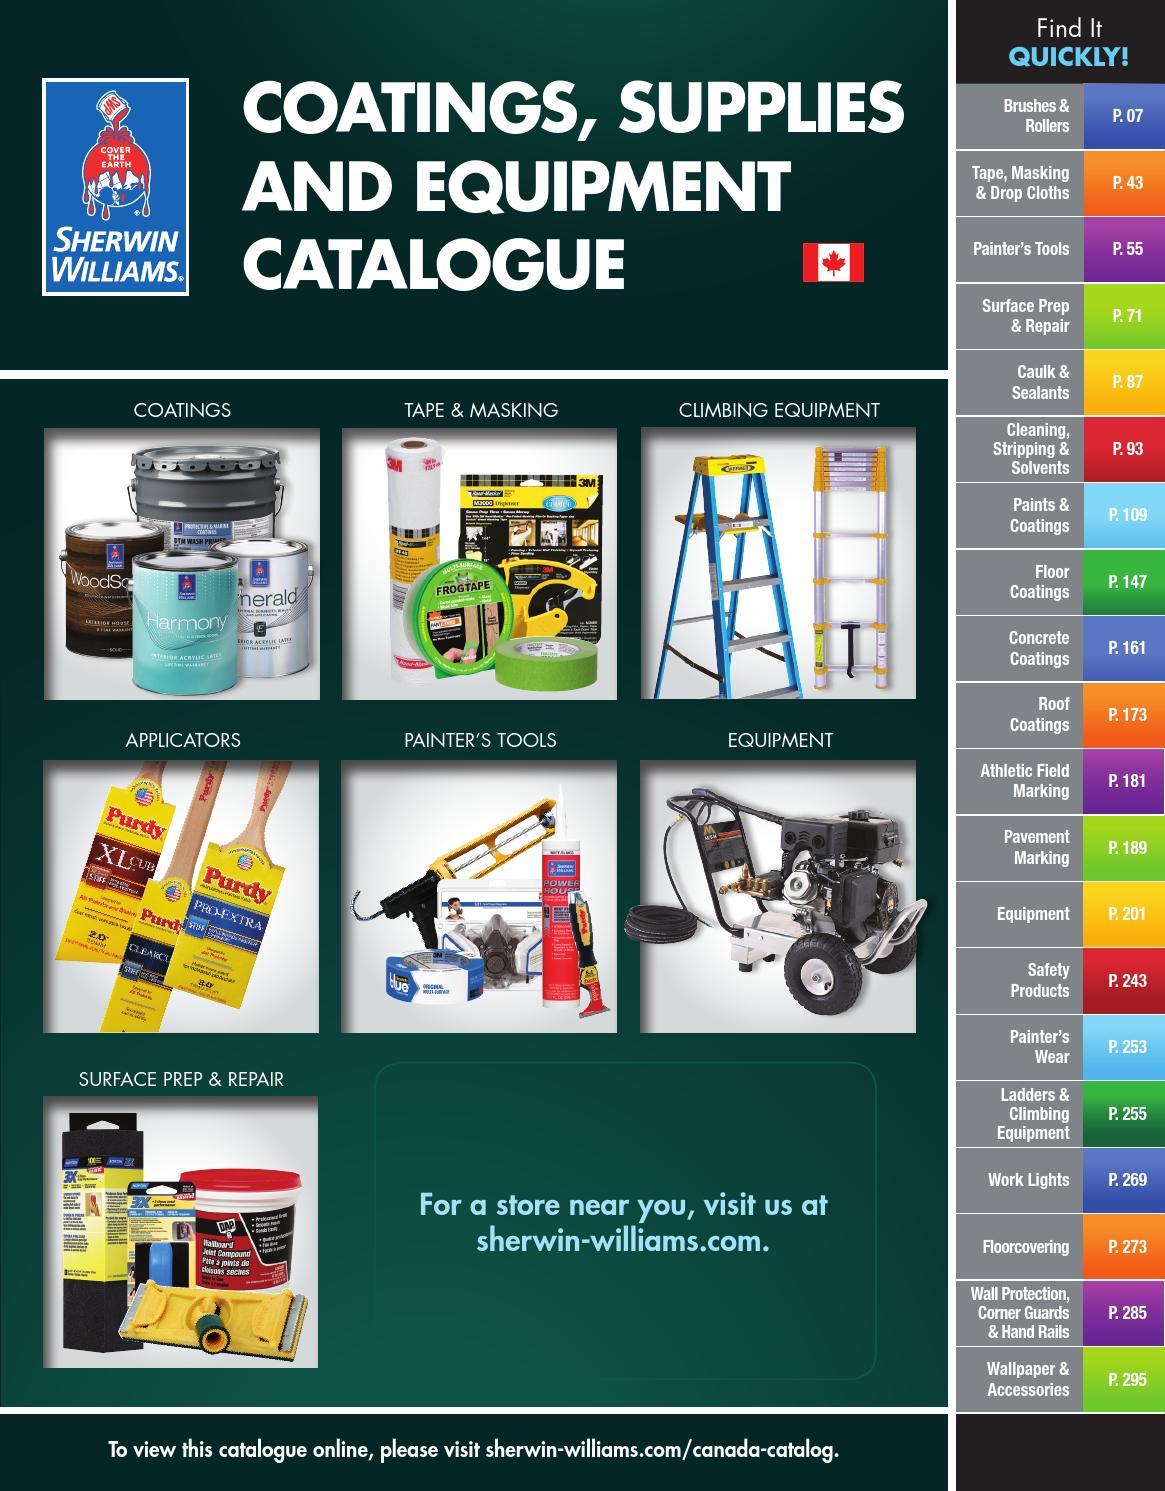 Sherwin Williams Canada Catalogue Coatings Supplies